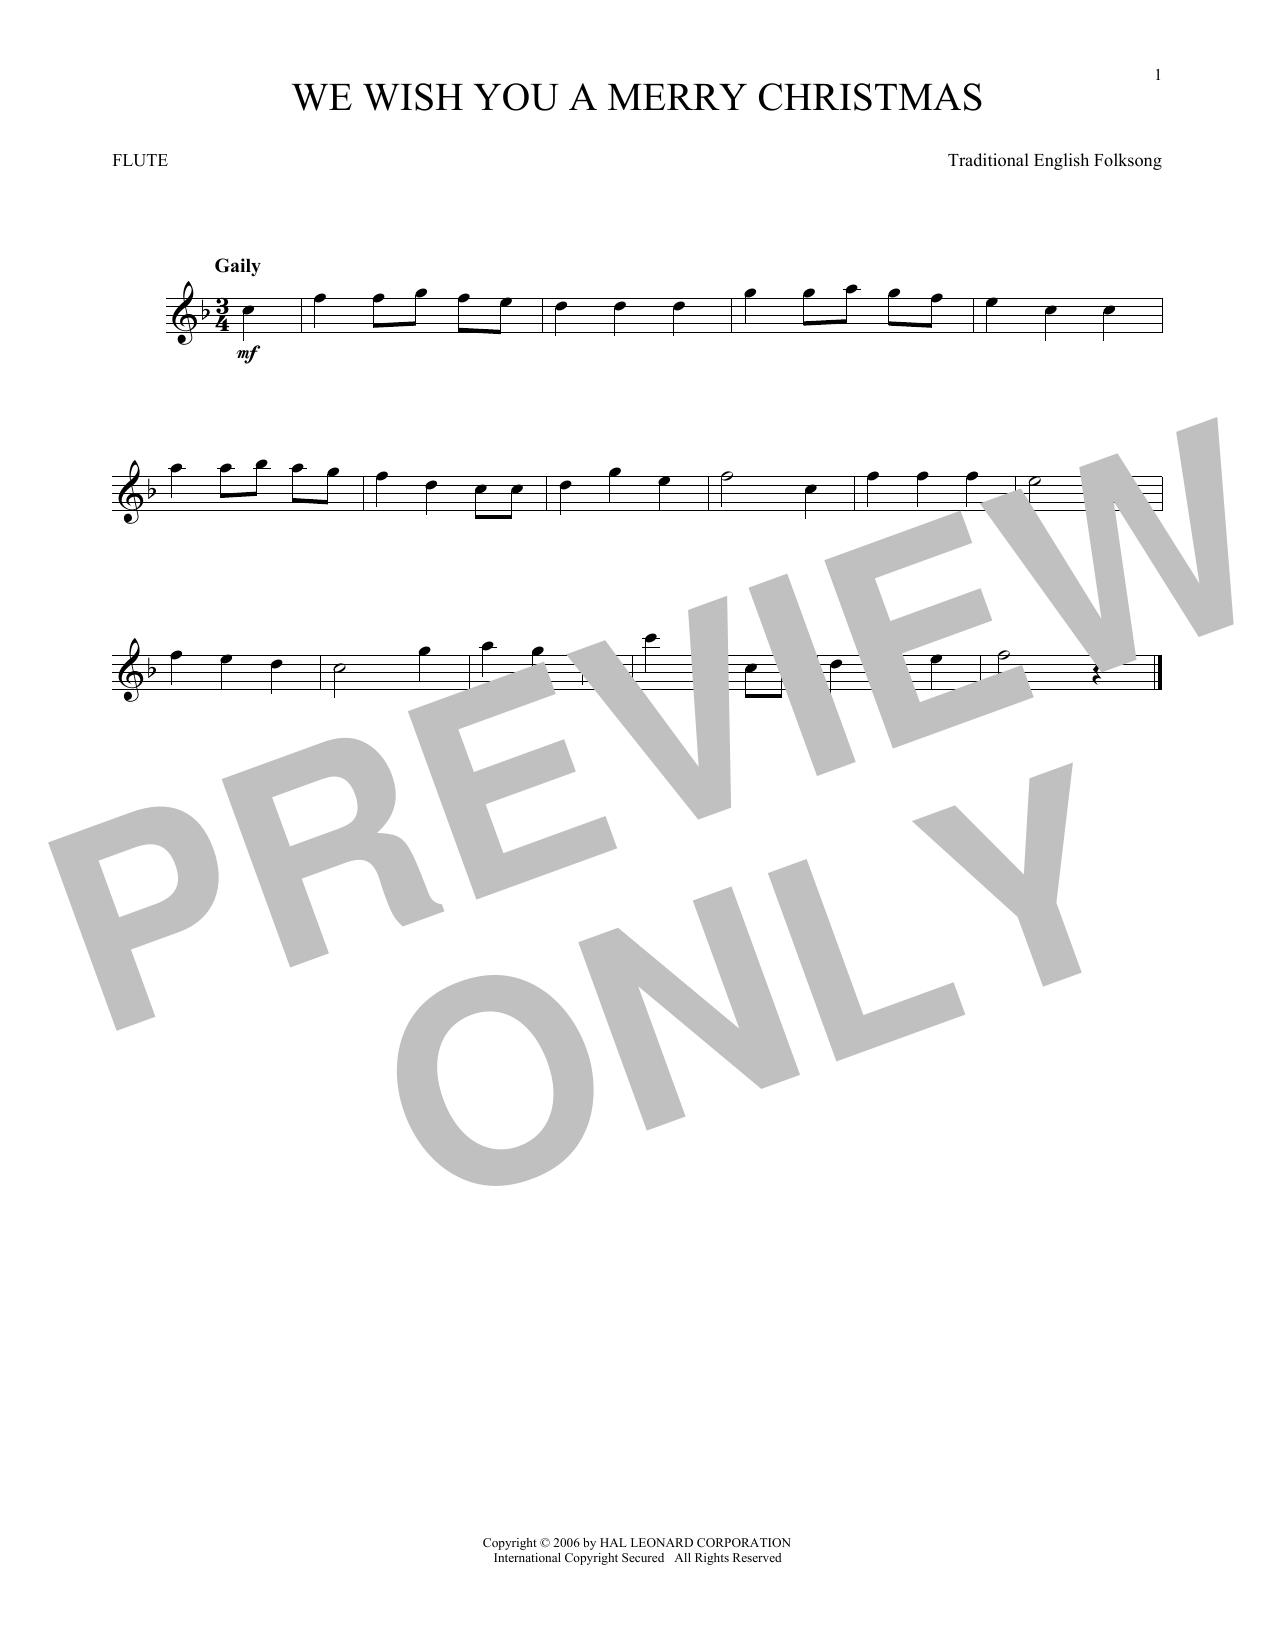 Partition flûte We Wish You A Merry Christmas de Christmas Carol - Flute traversiere